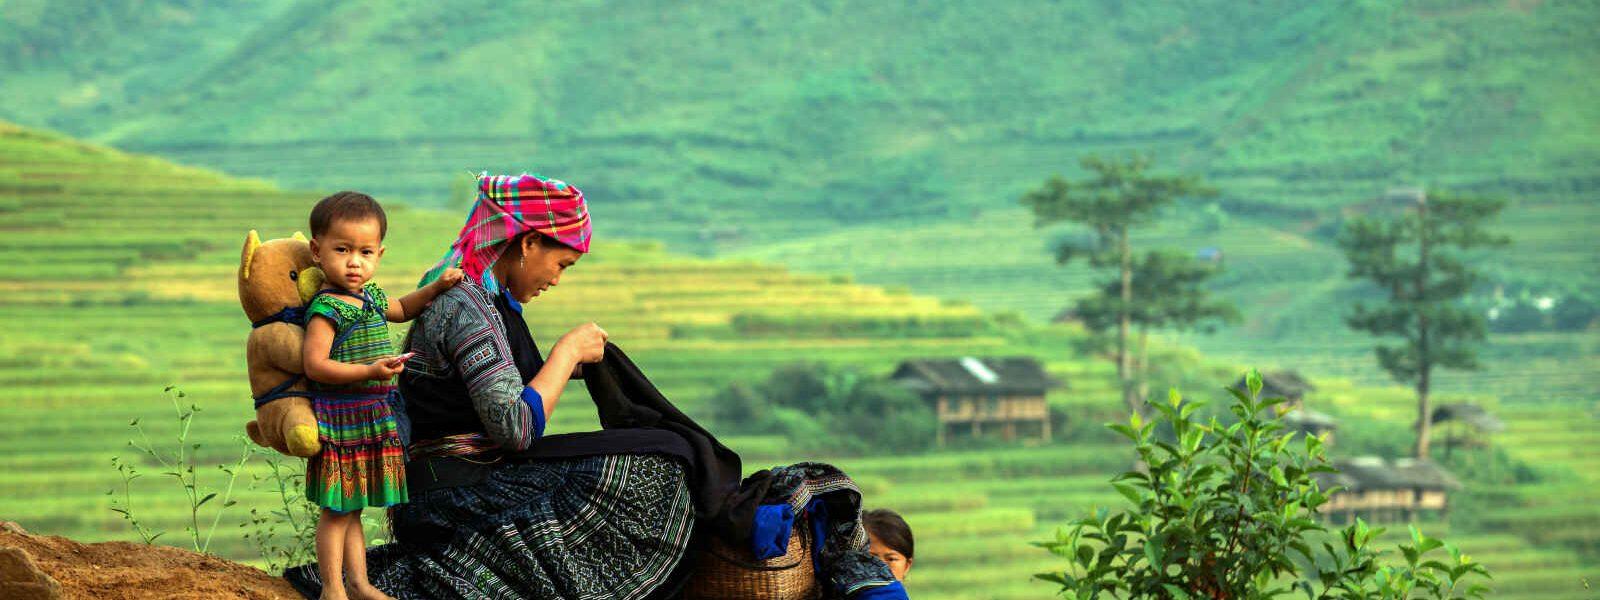 Famille, Hmong, Laos